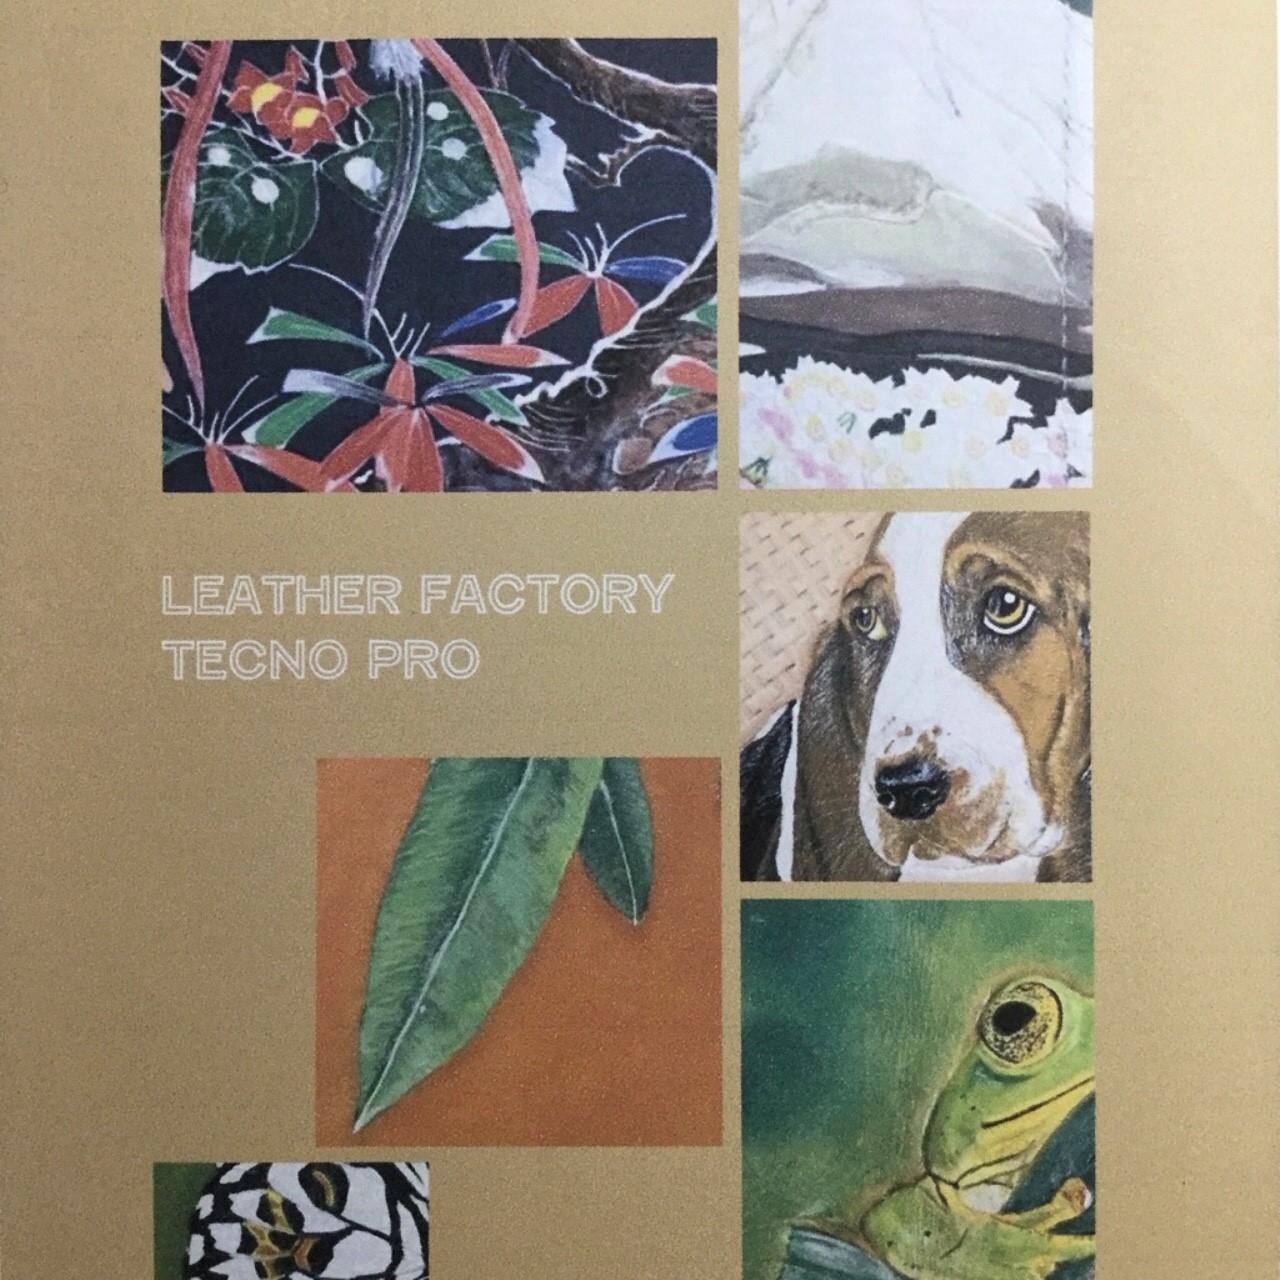 Leather-factory-tecno-pro・テクノプロ